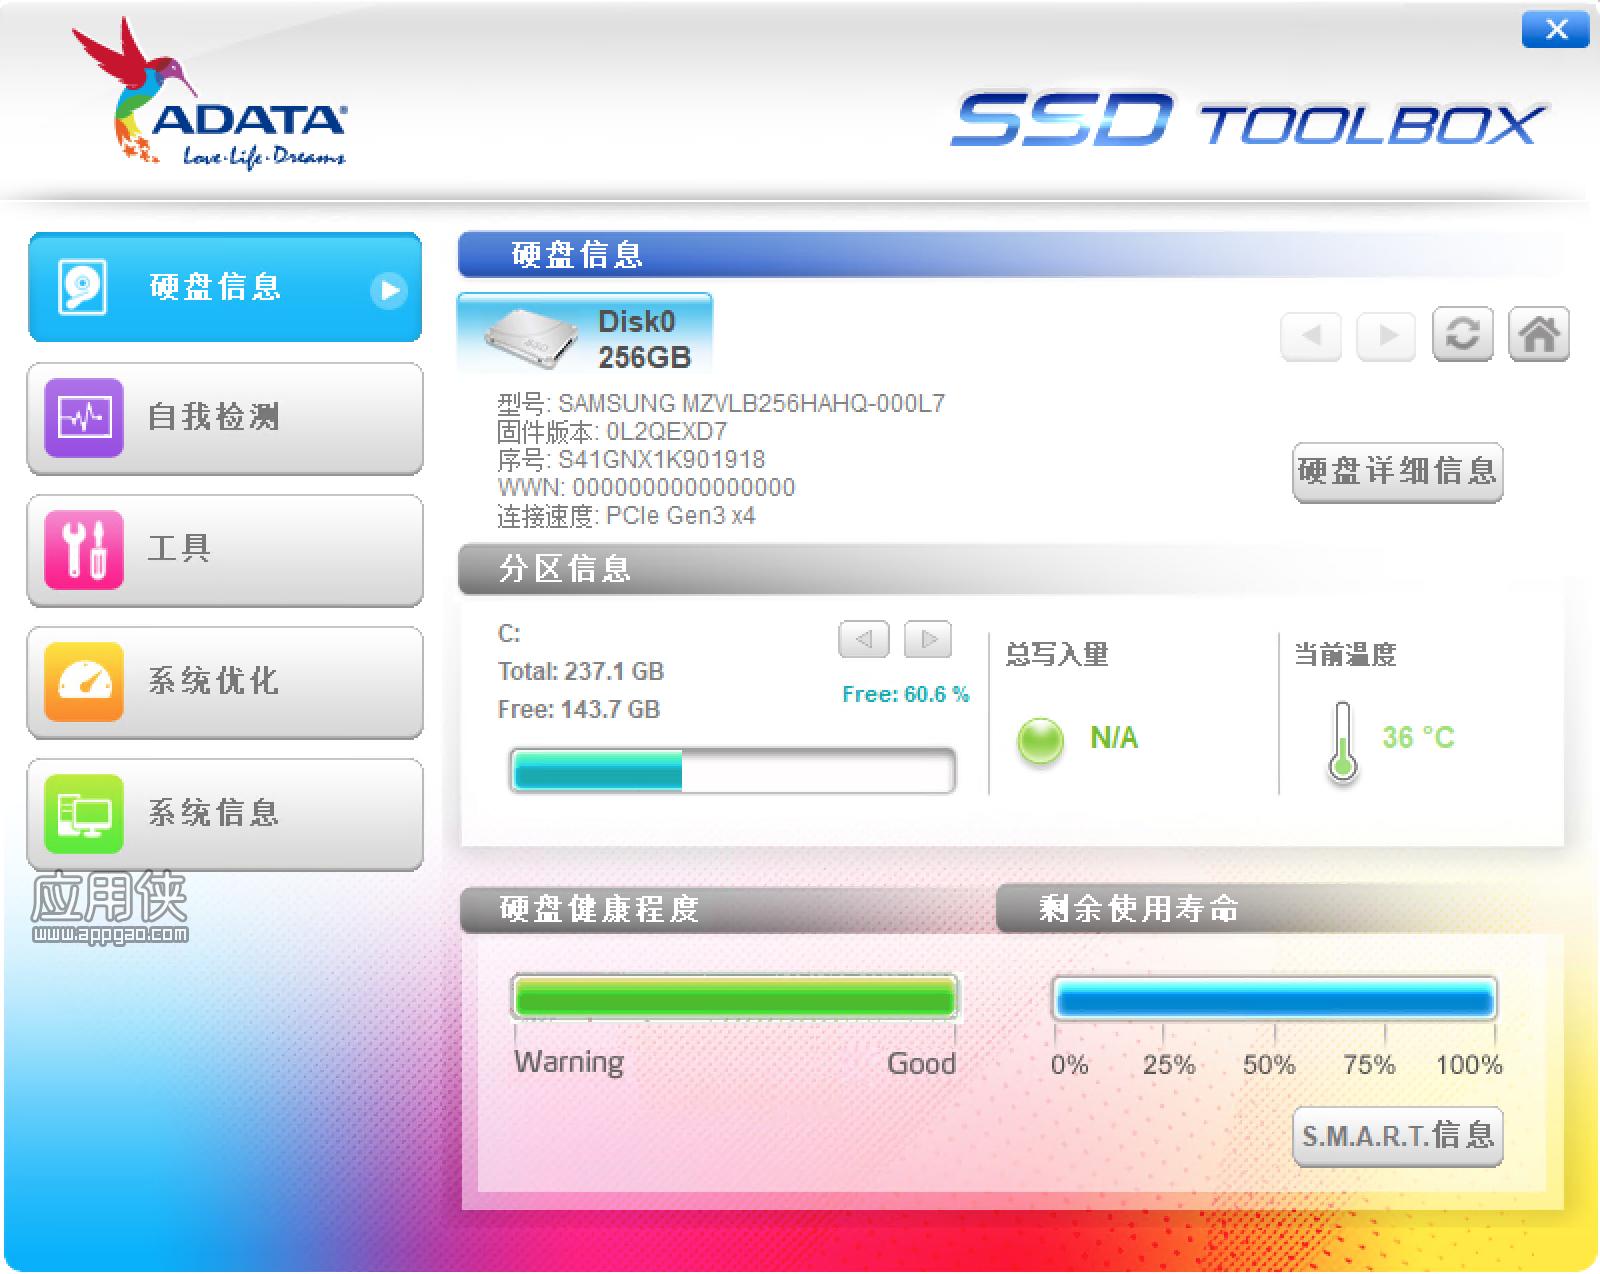 ADATA SSD ToolBox - 威刚 SSD 工具箱